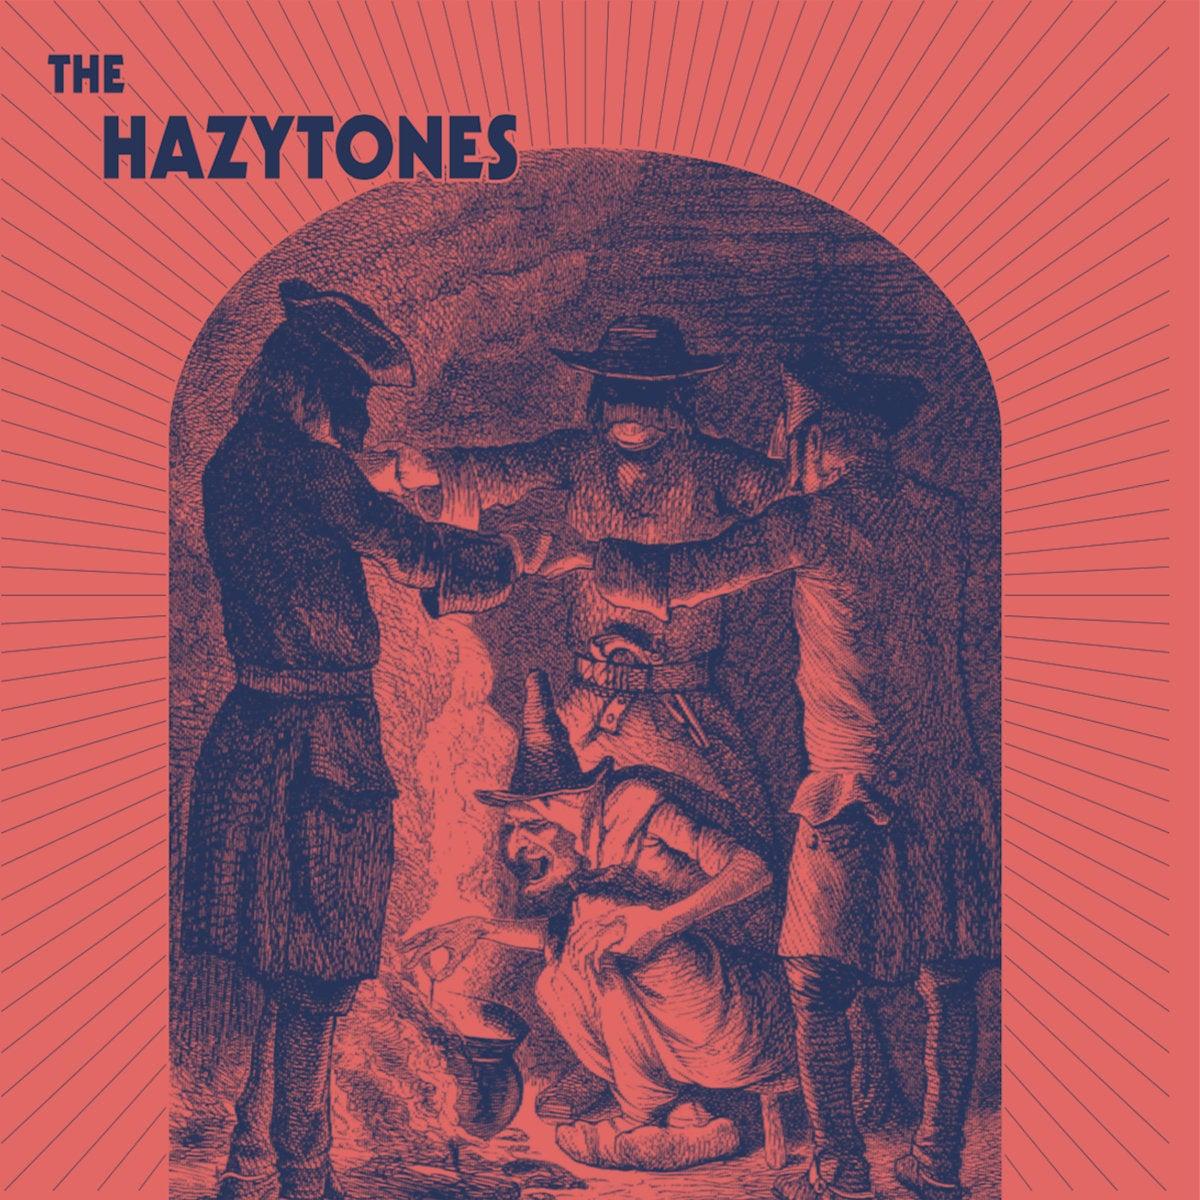 Image of The Hazytones - ST Debut Album CD